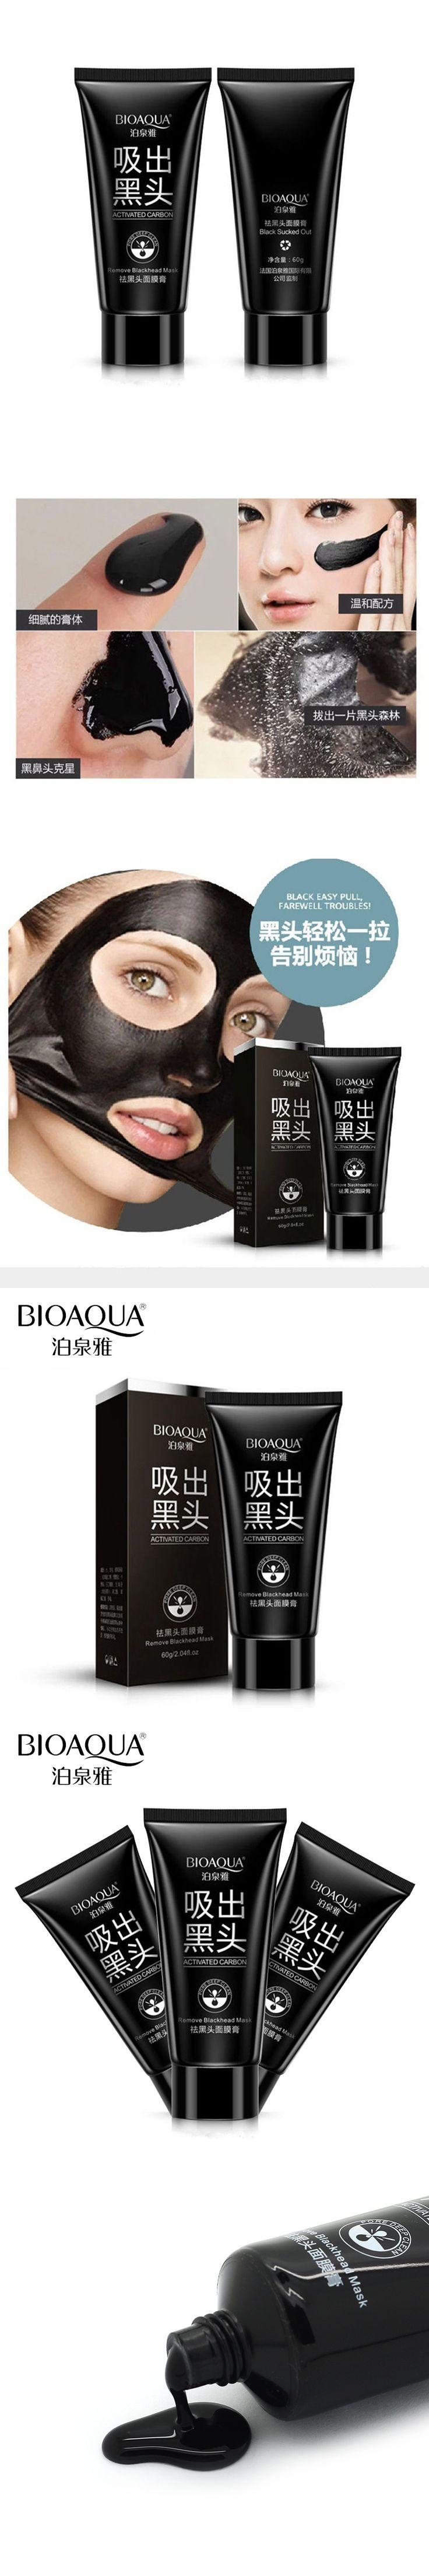 BIOAQUA Brand Suction Black Mask Facial Mask Nose Blackhead Remover Peel Off Black Head Acne Treatments Deep Clean Face Care